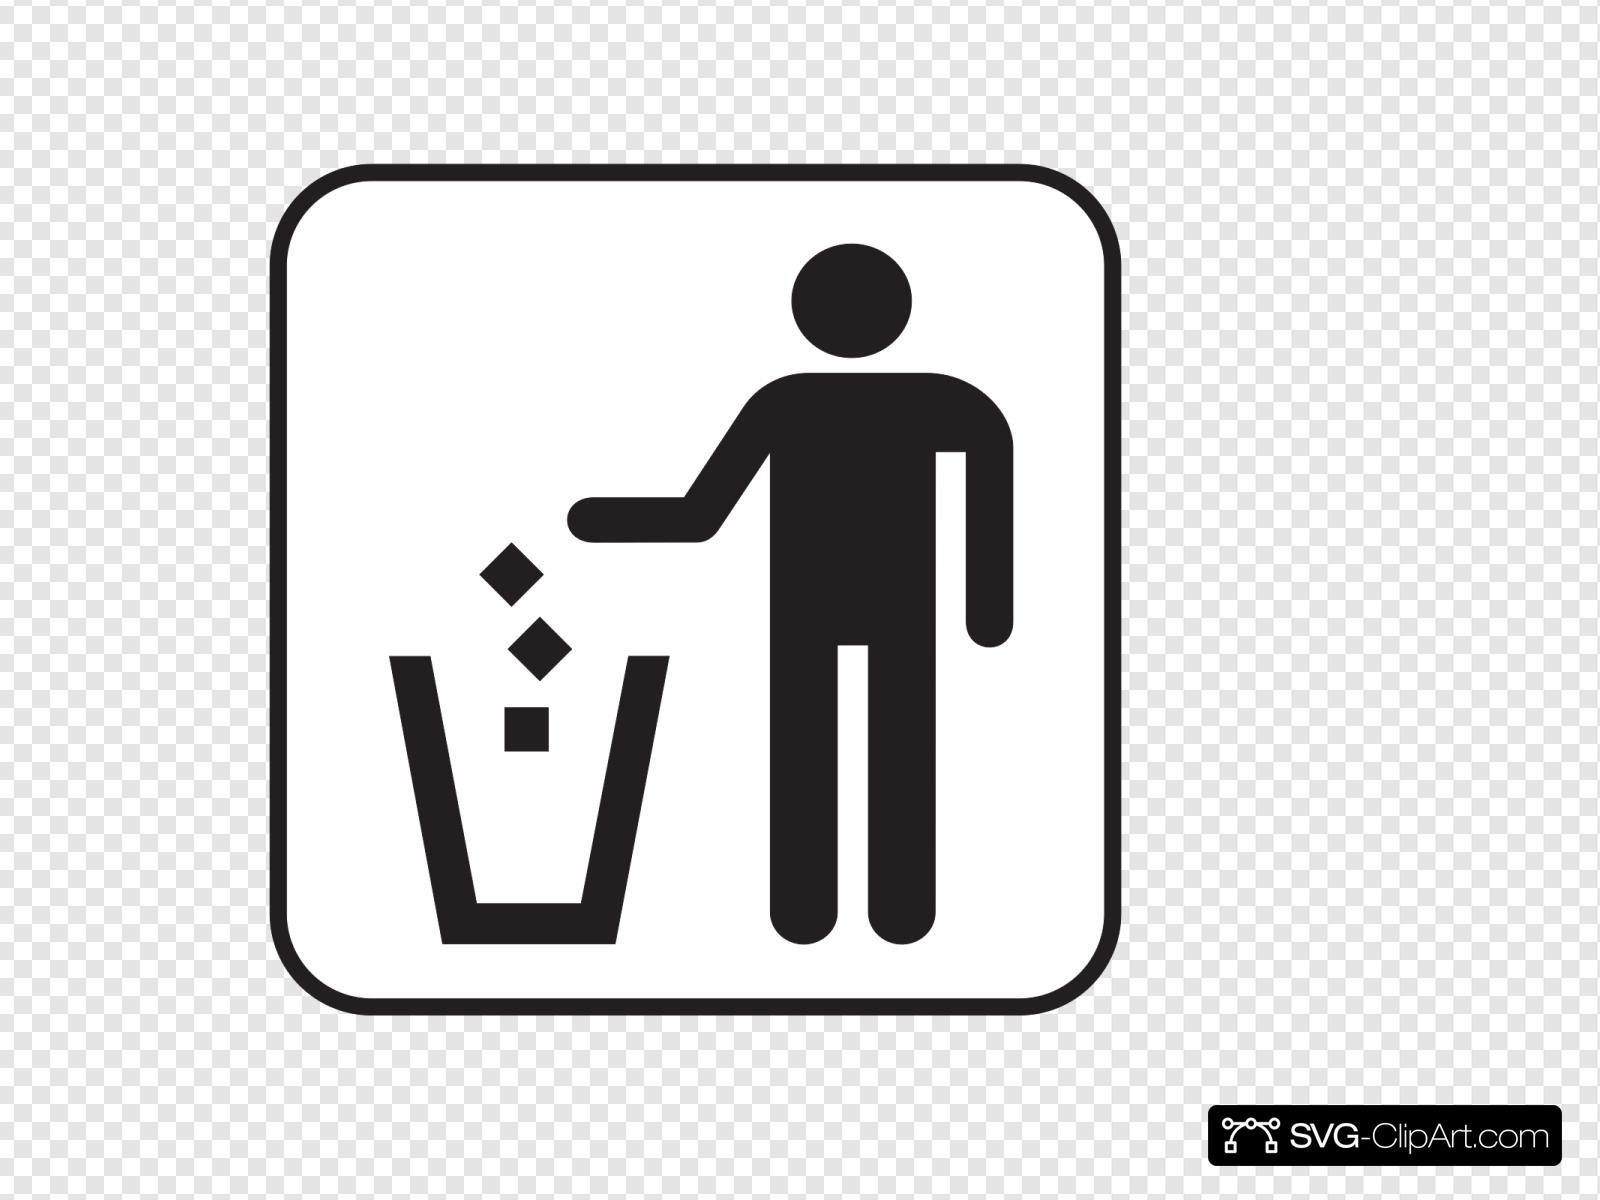 tong sampah svg vector tong sampah clip art svg clipart tong sampah clip art svg clipart